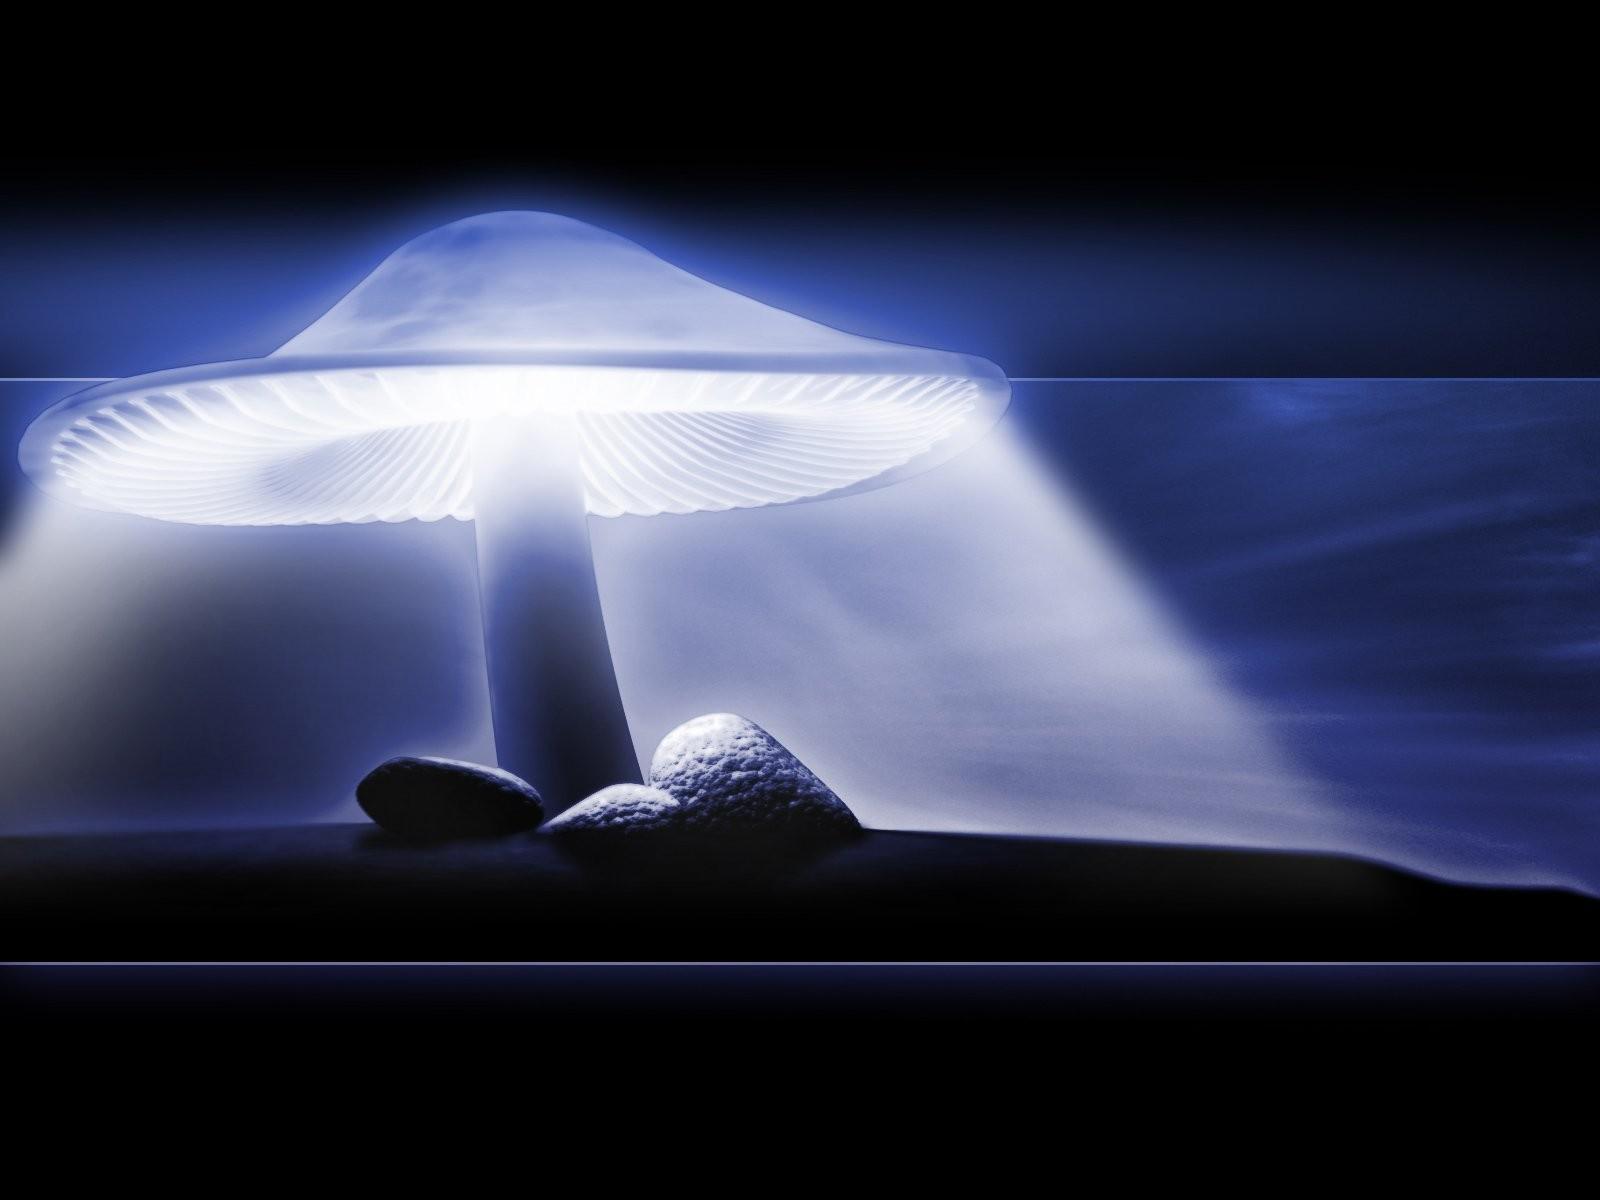 http://4.bp.blogspot.com/_yy-KMXtYQTc/S7j5U5NaTDI/AAAAAAAAABw/S__MrC6S6Io/s1600/Neon_mushroom.jpg